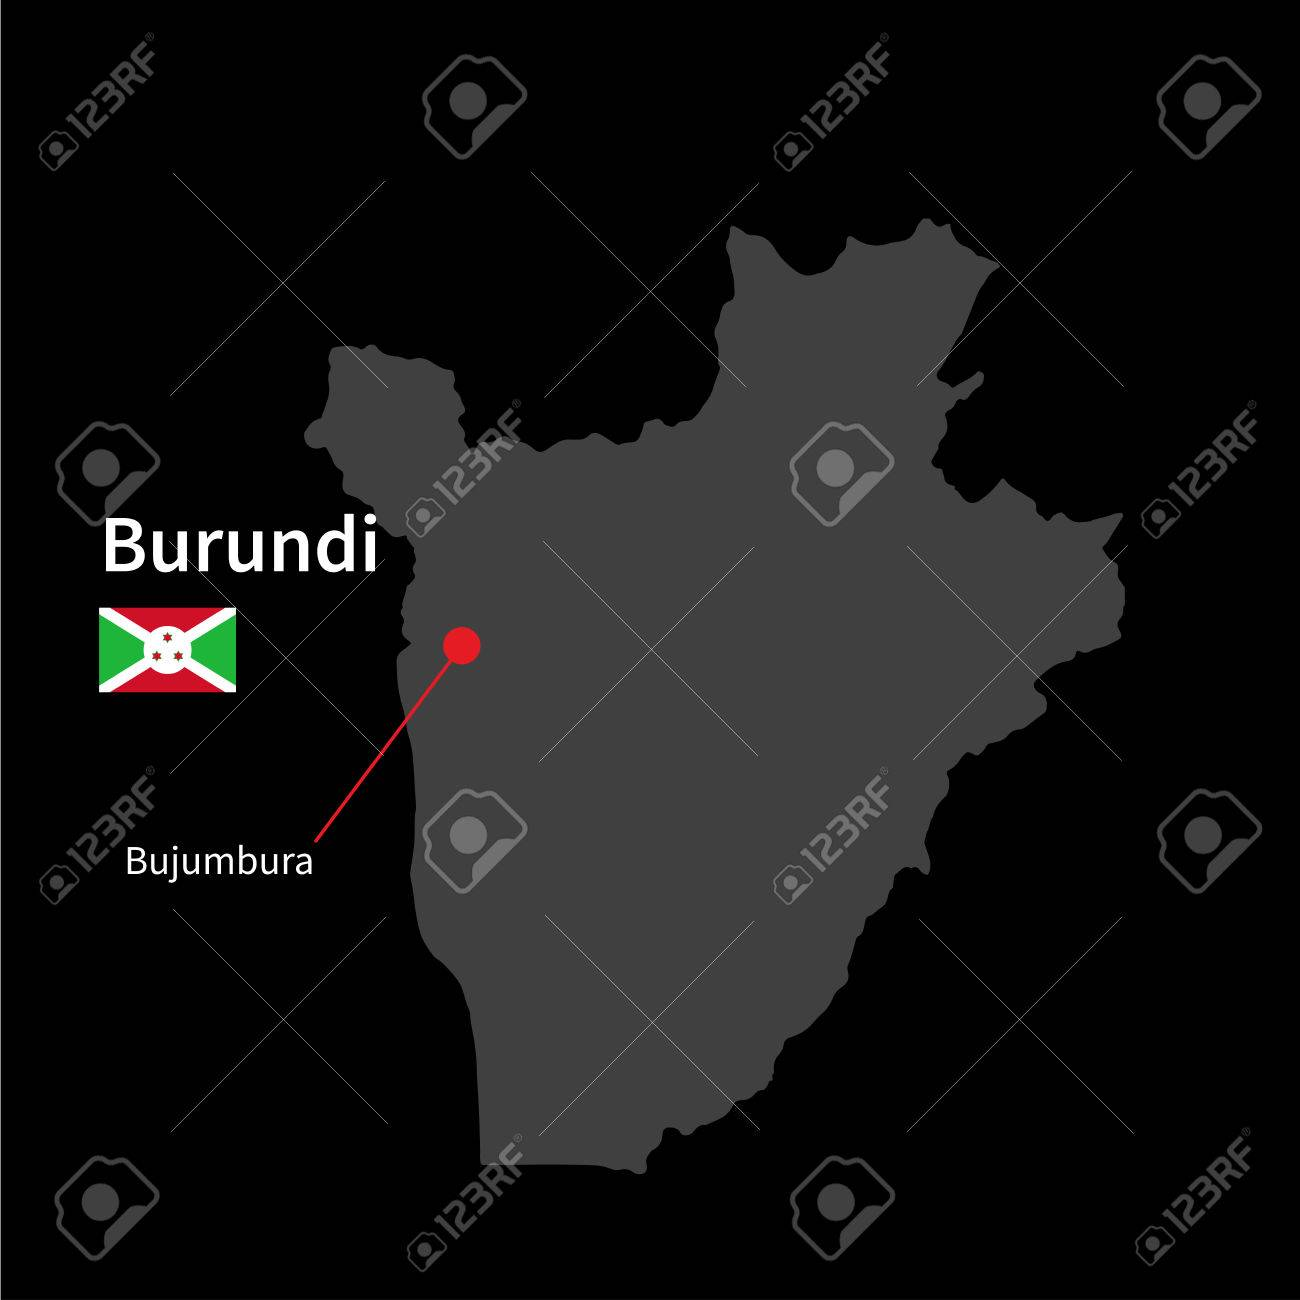 Detailed Map Of Burundi And Capital City Bujumbura With Flag